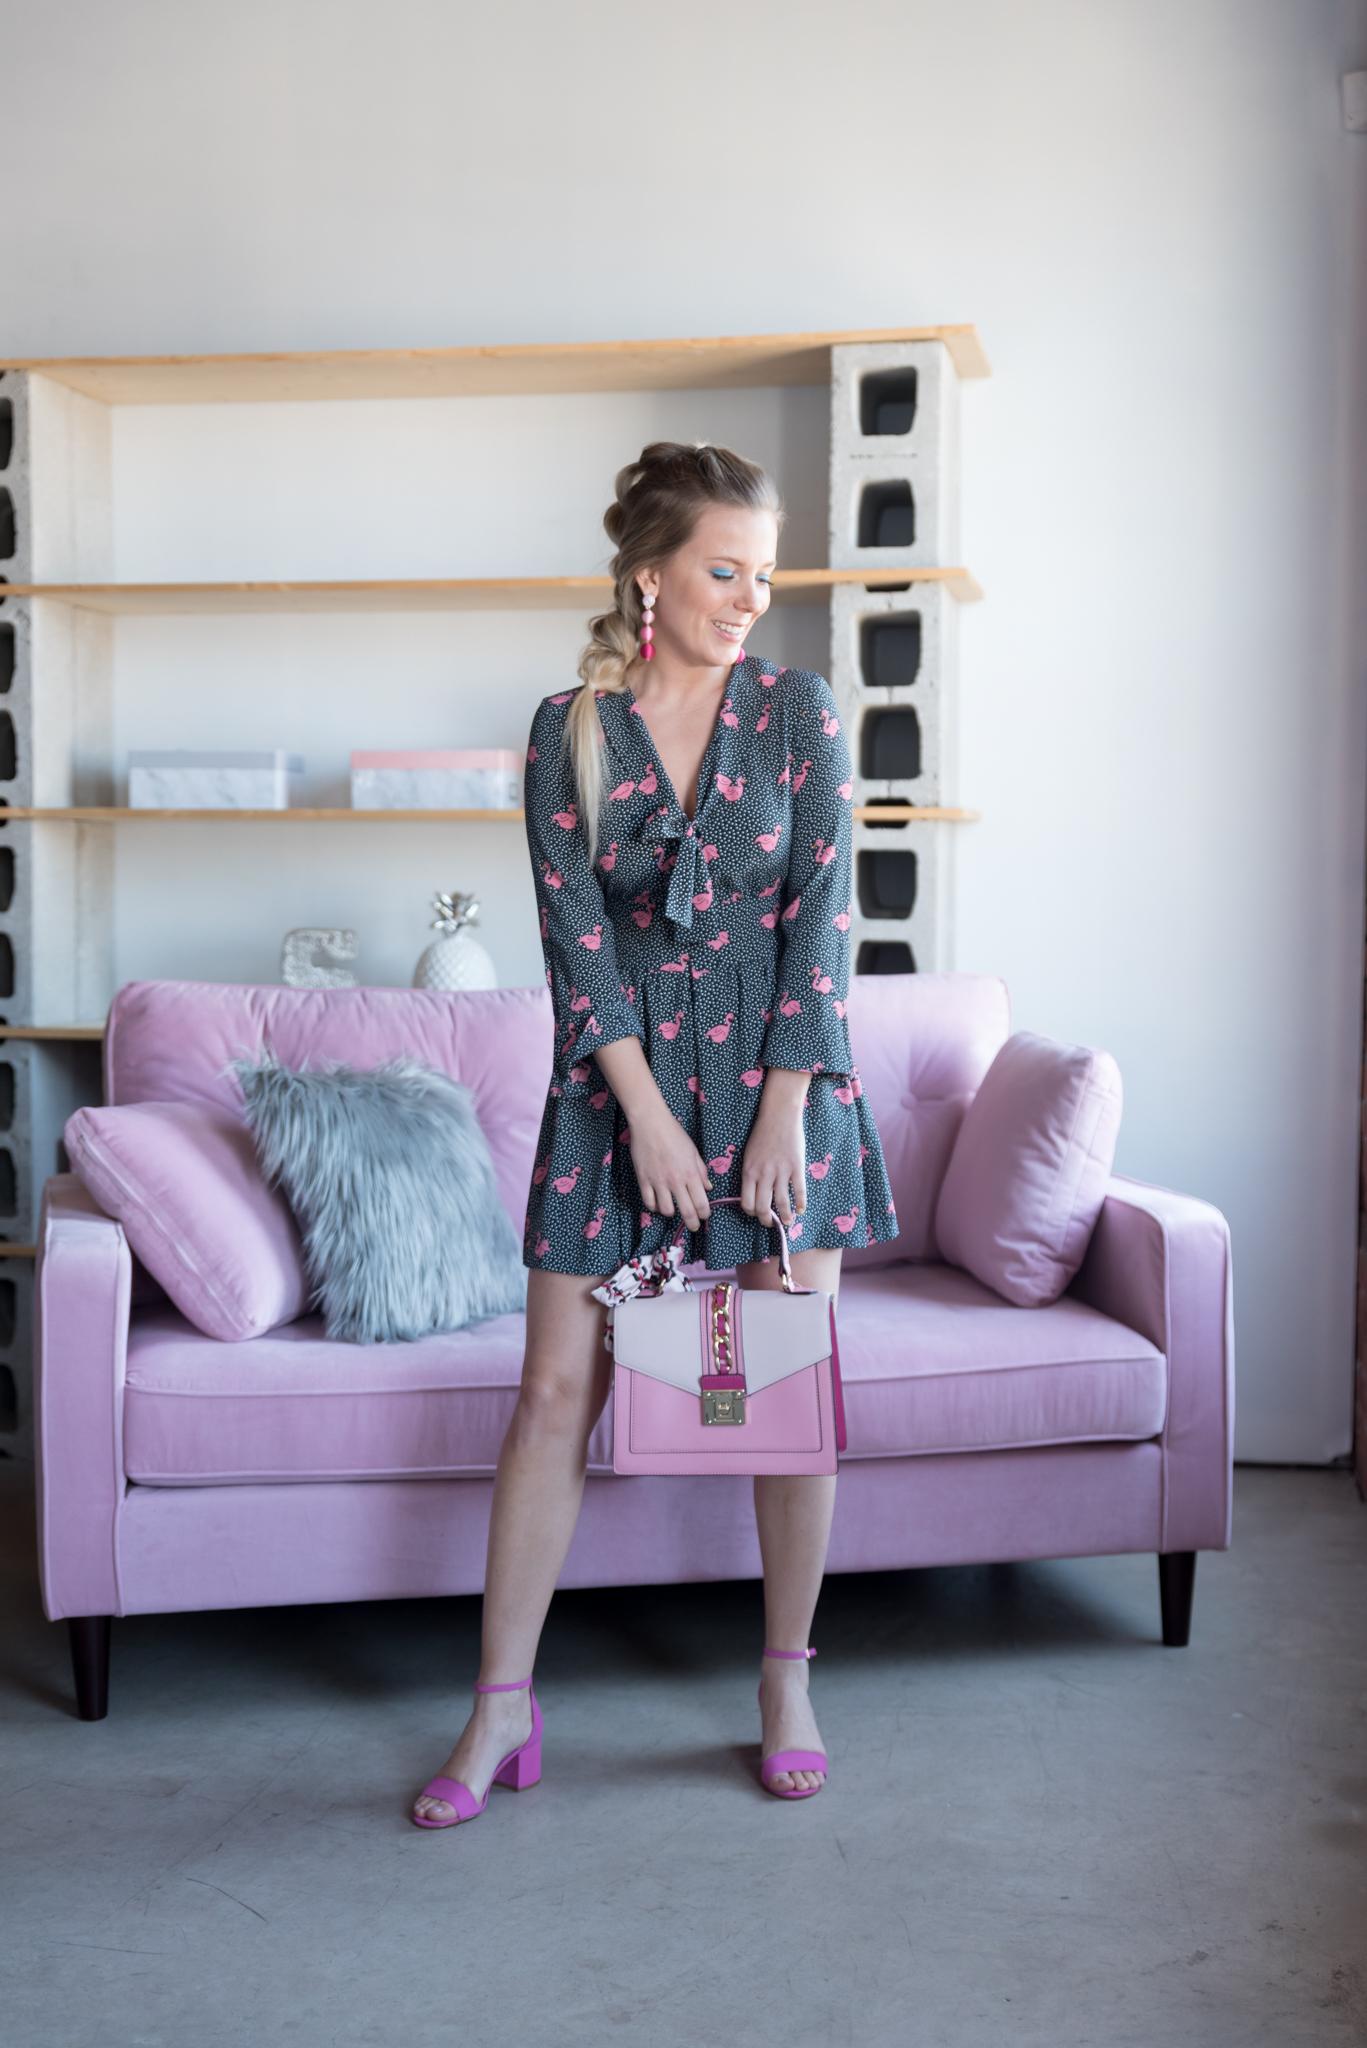 Lookbook printanier – Flamants roses